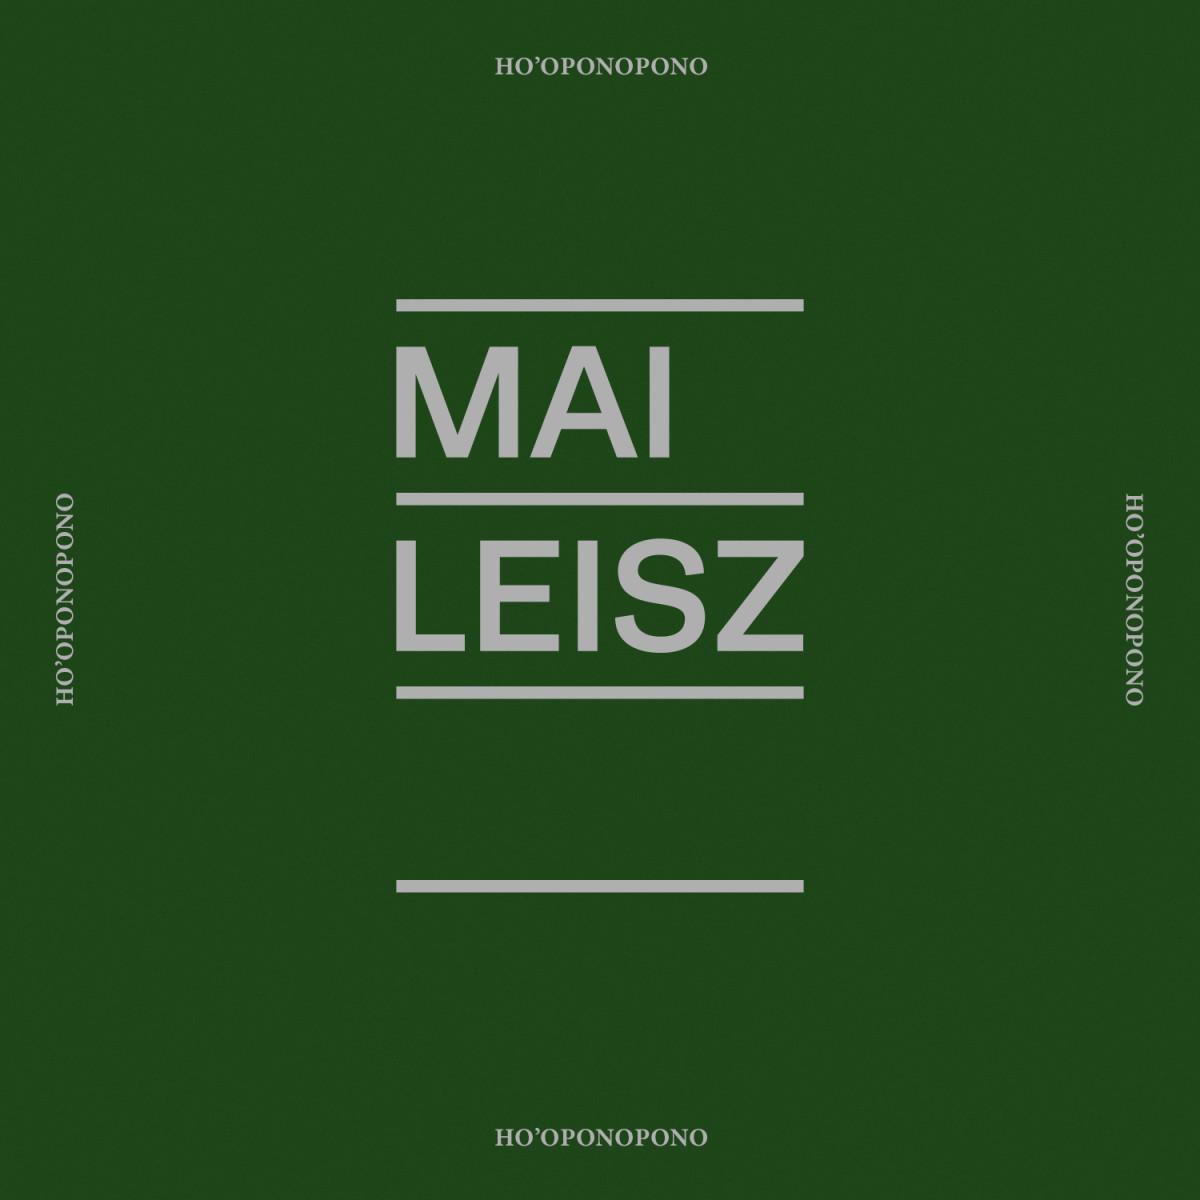 Mai Leisz - Ho'oponopono_cover